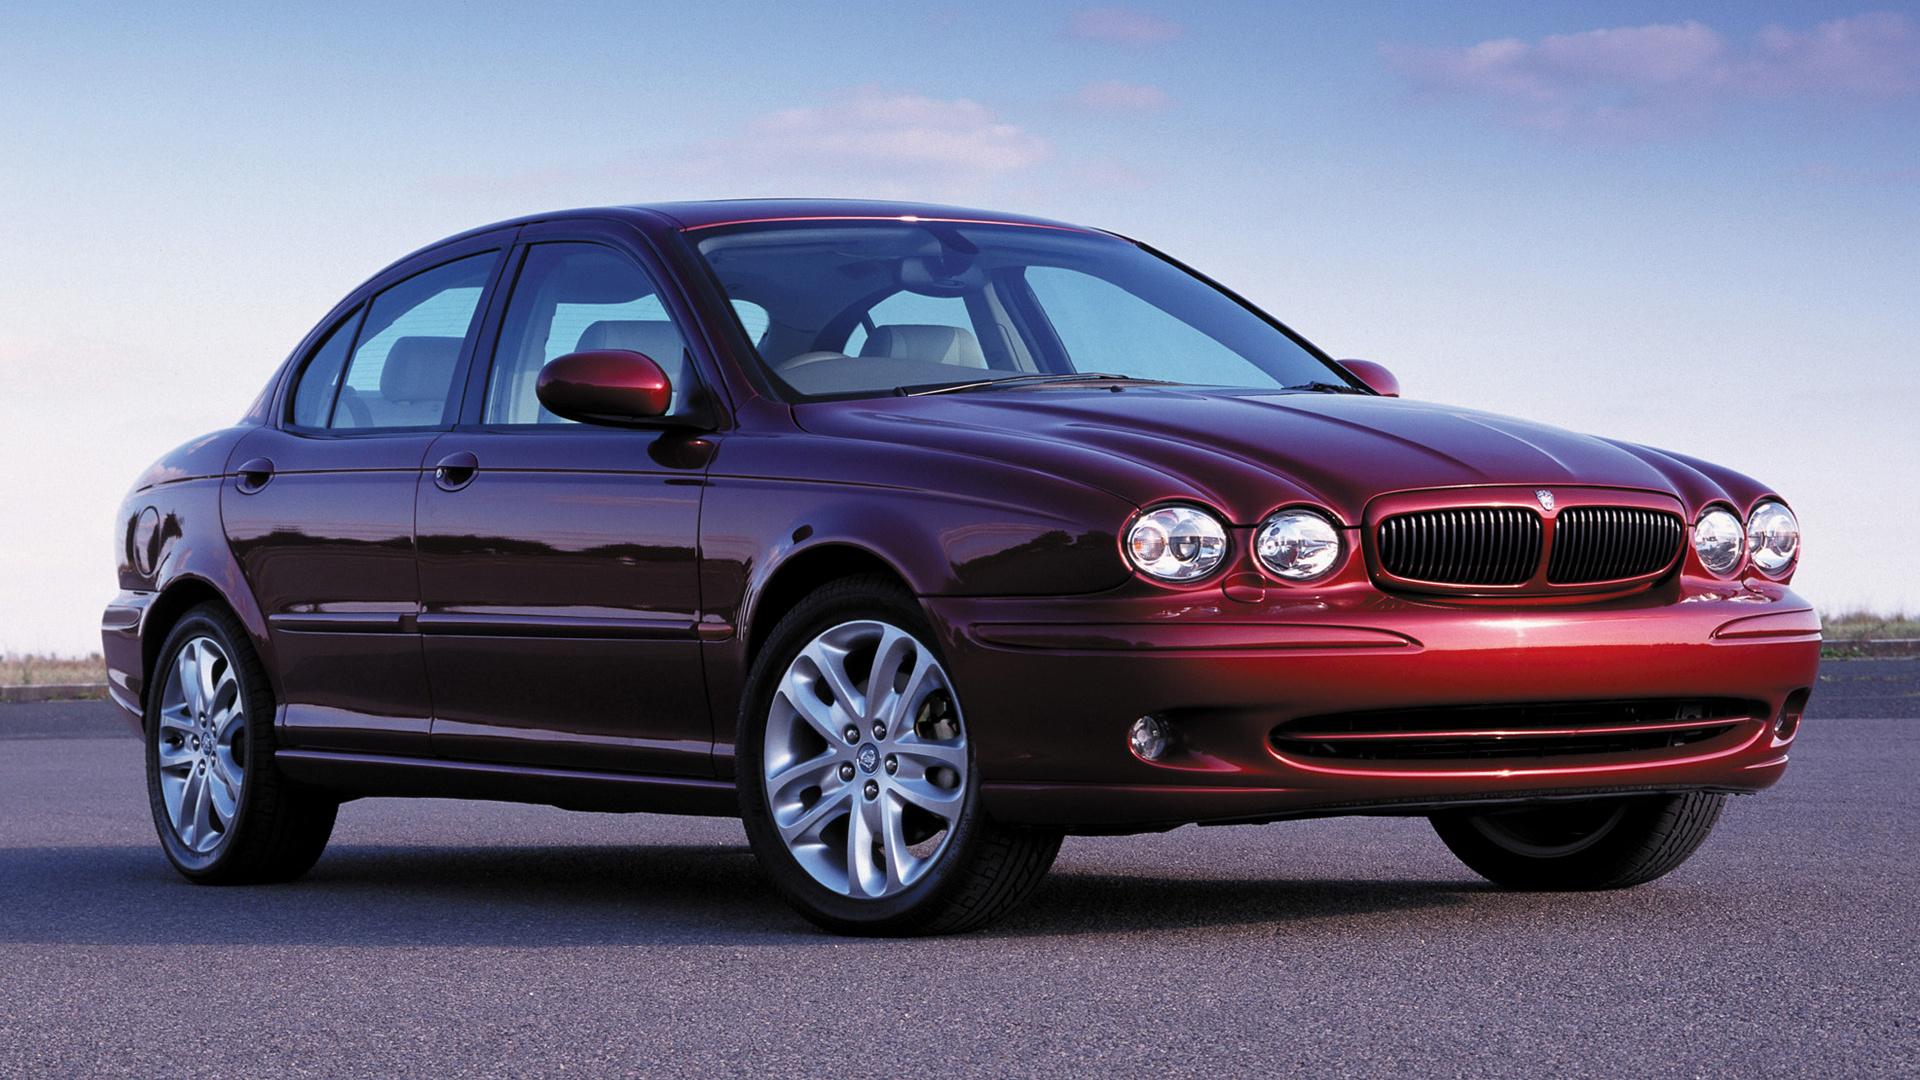 2002 Jaguar X-Type (UK) - Wallpapers and HD Images | Car Pixel